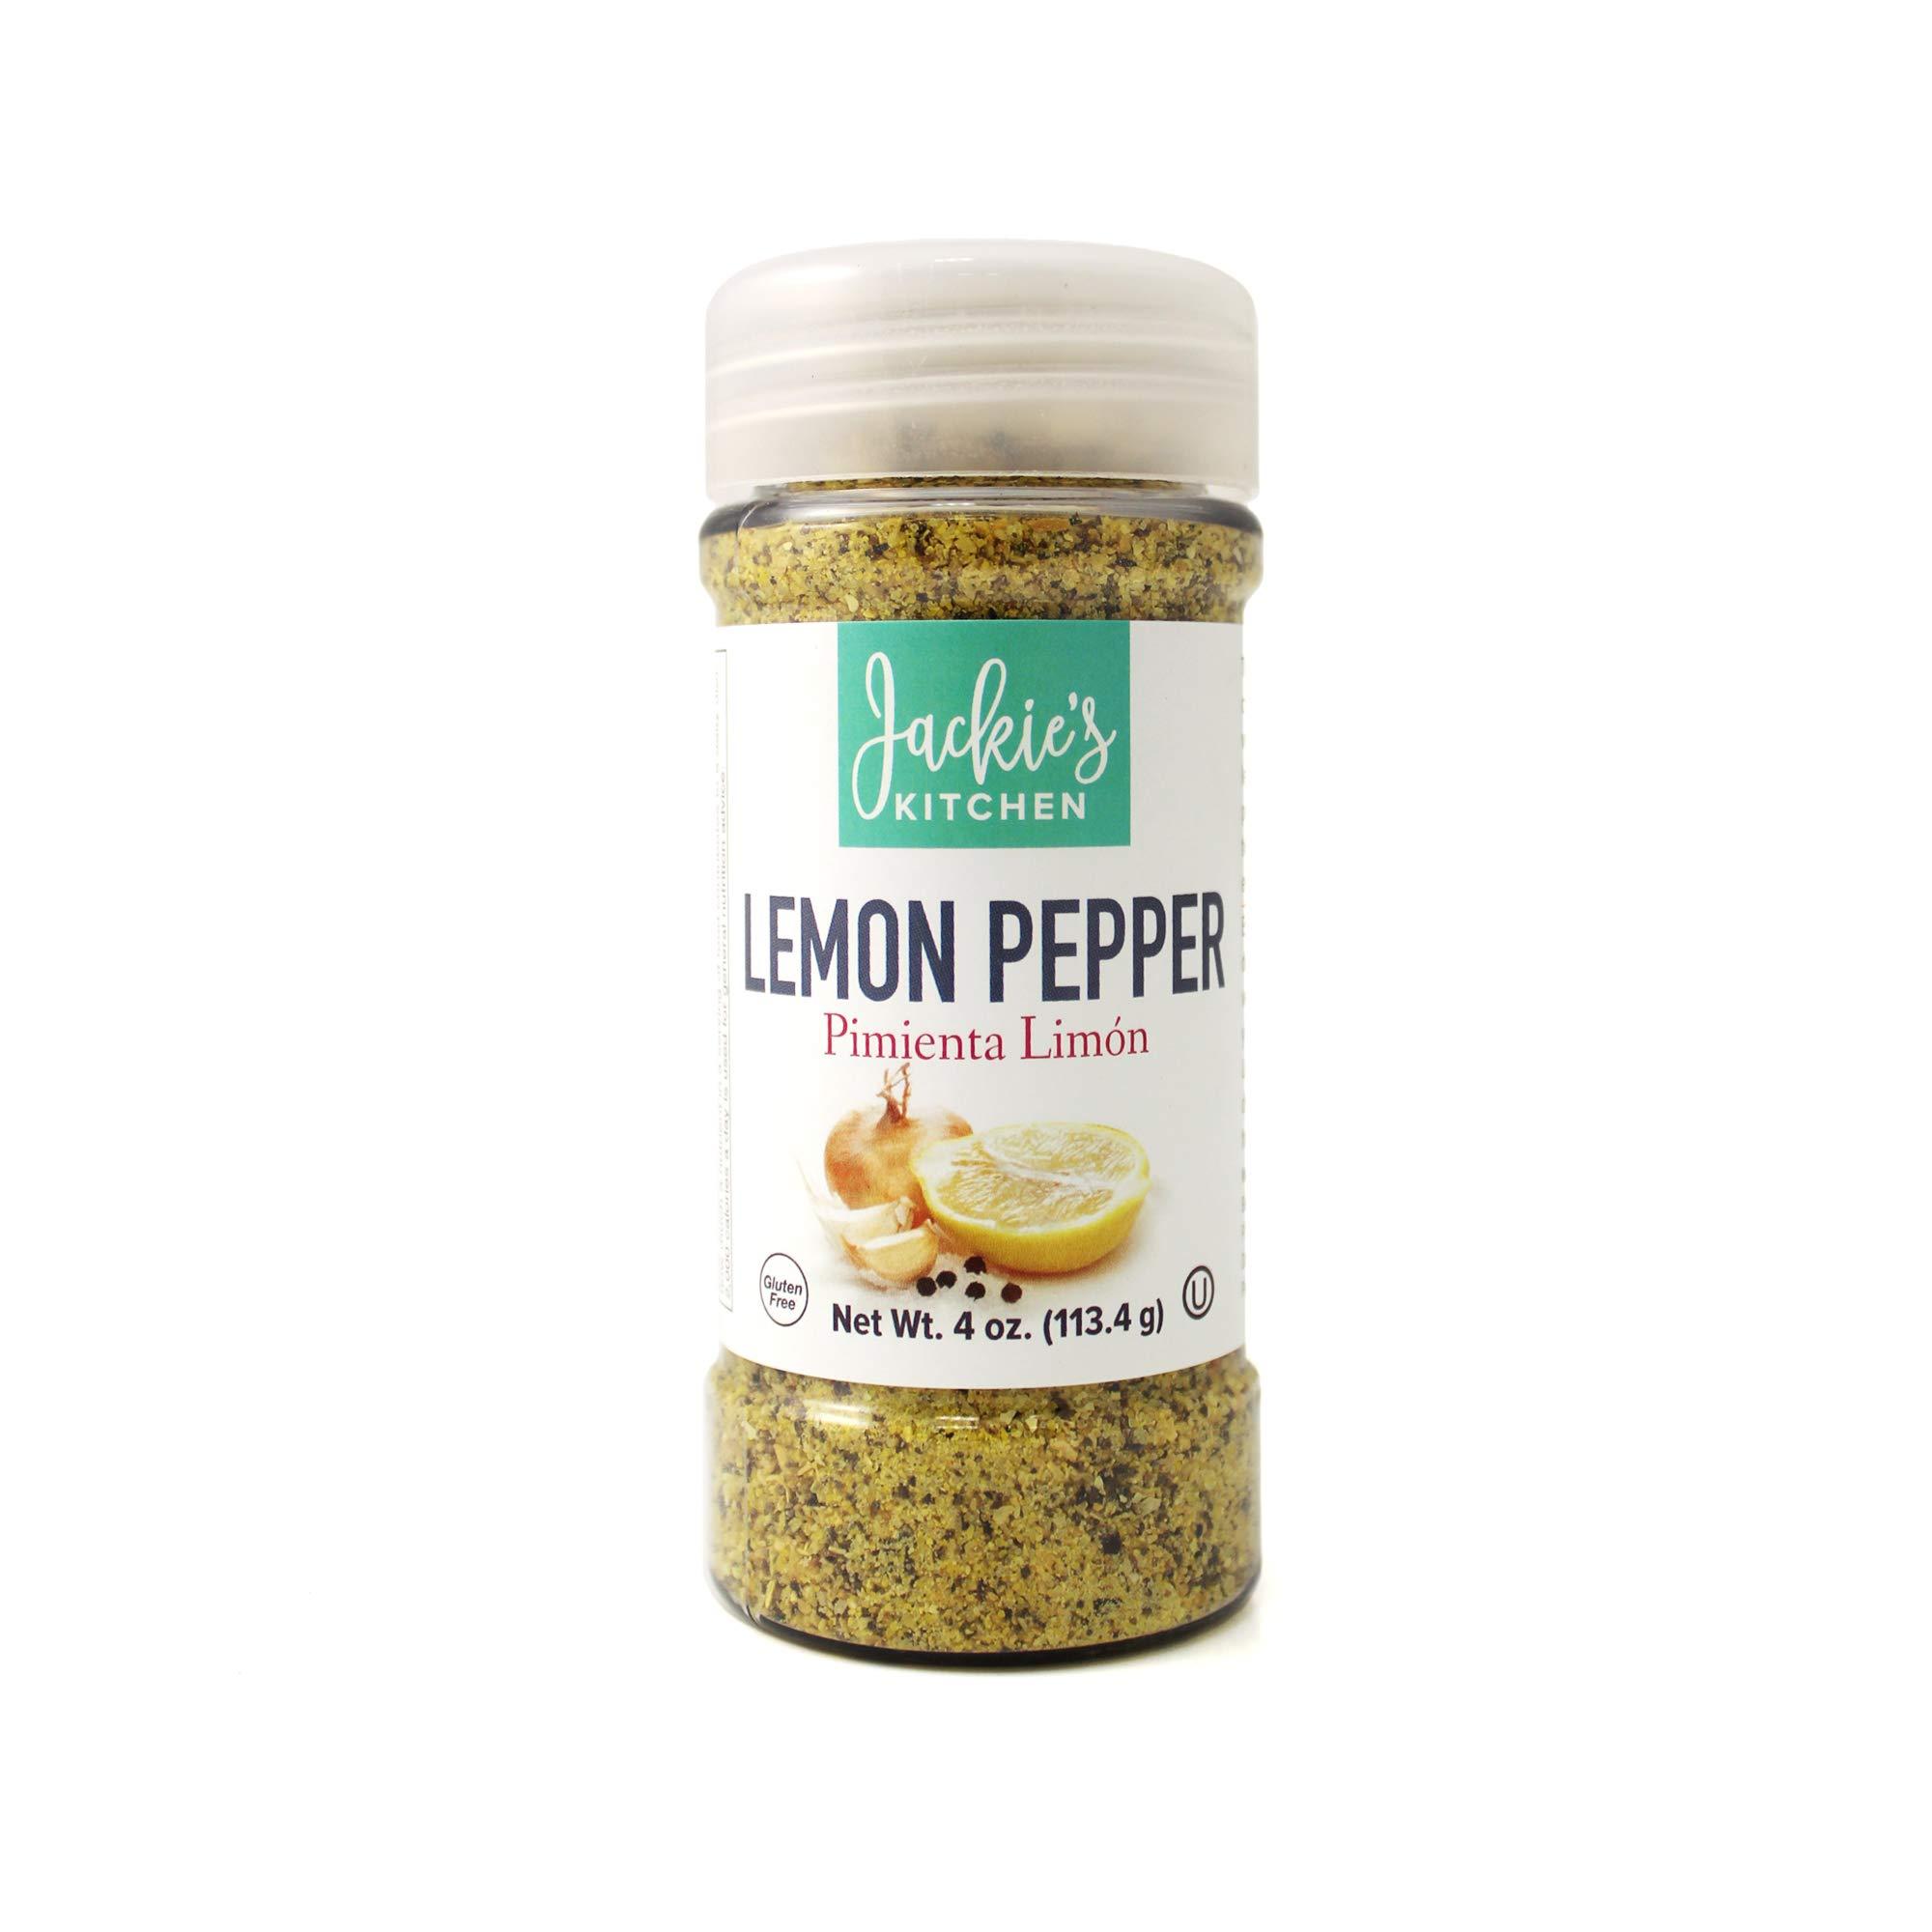 Jackie's Kitchen Lemon Pepper, 4 Ounce